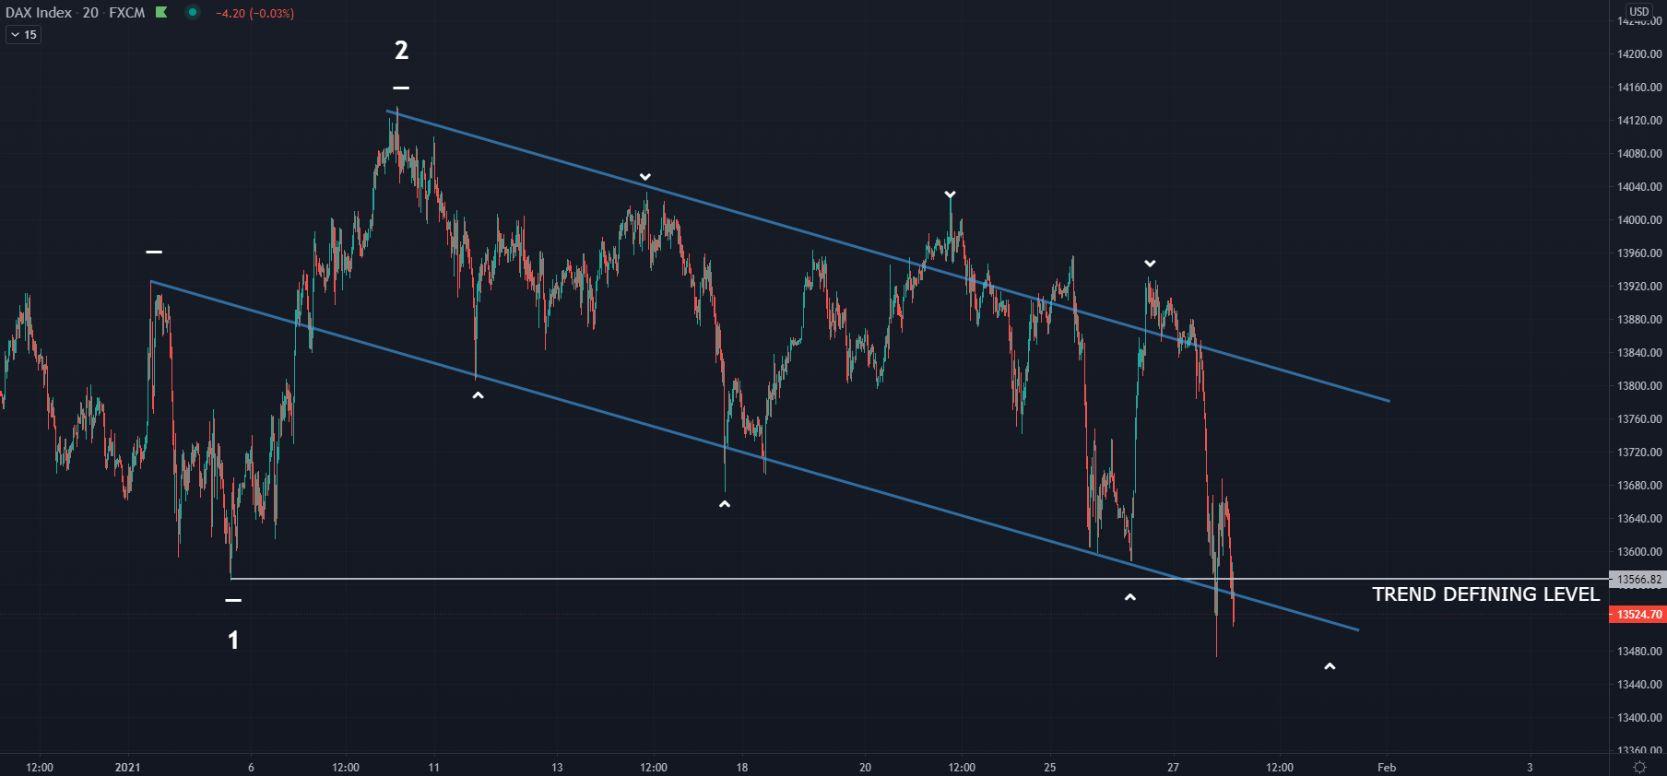 dax analysis 27-01-2021